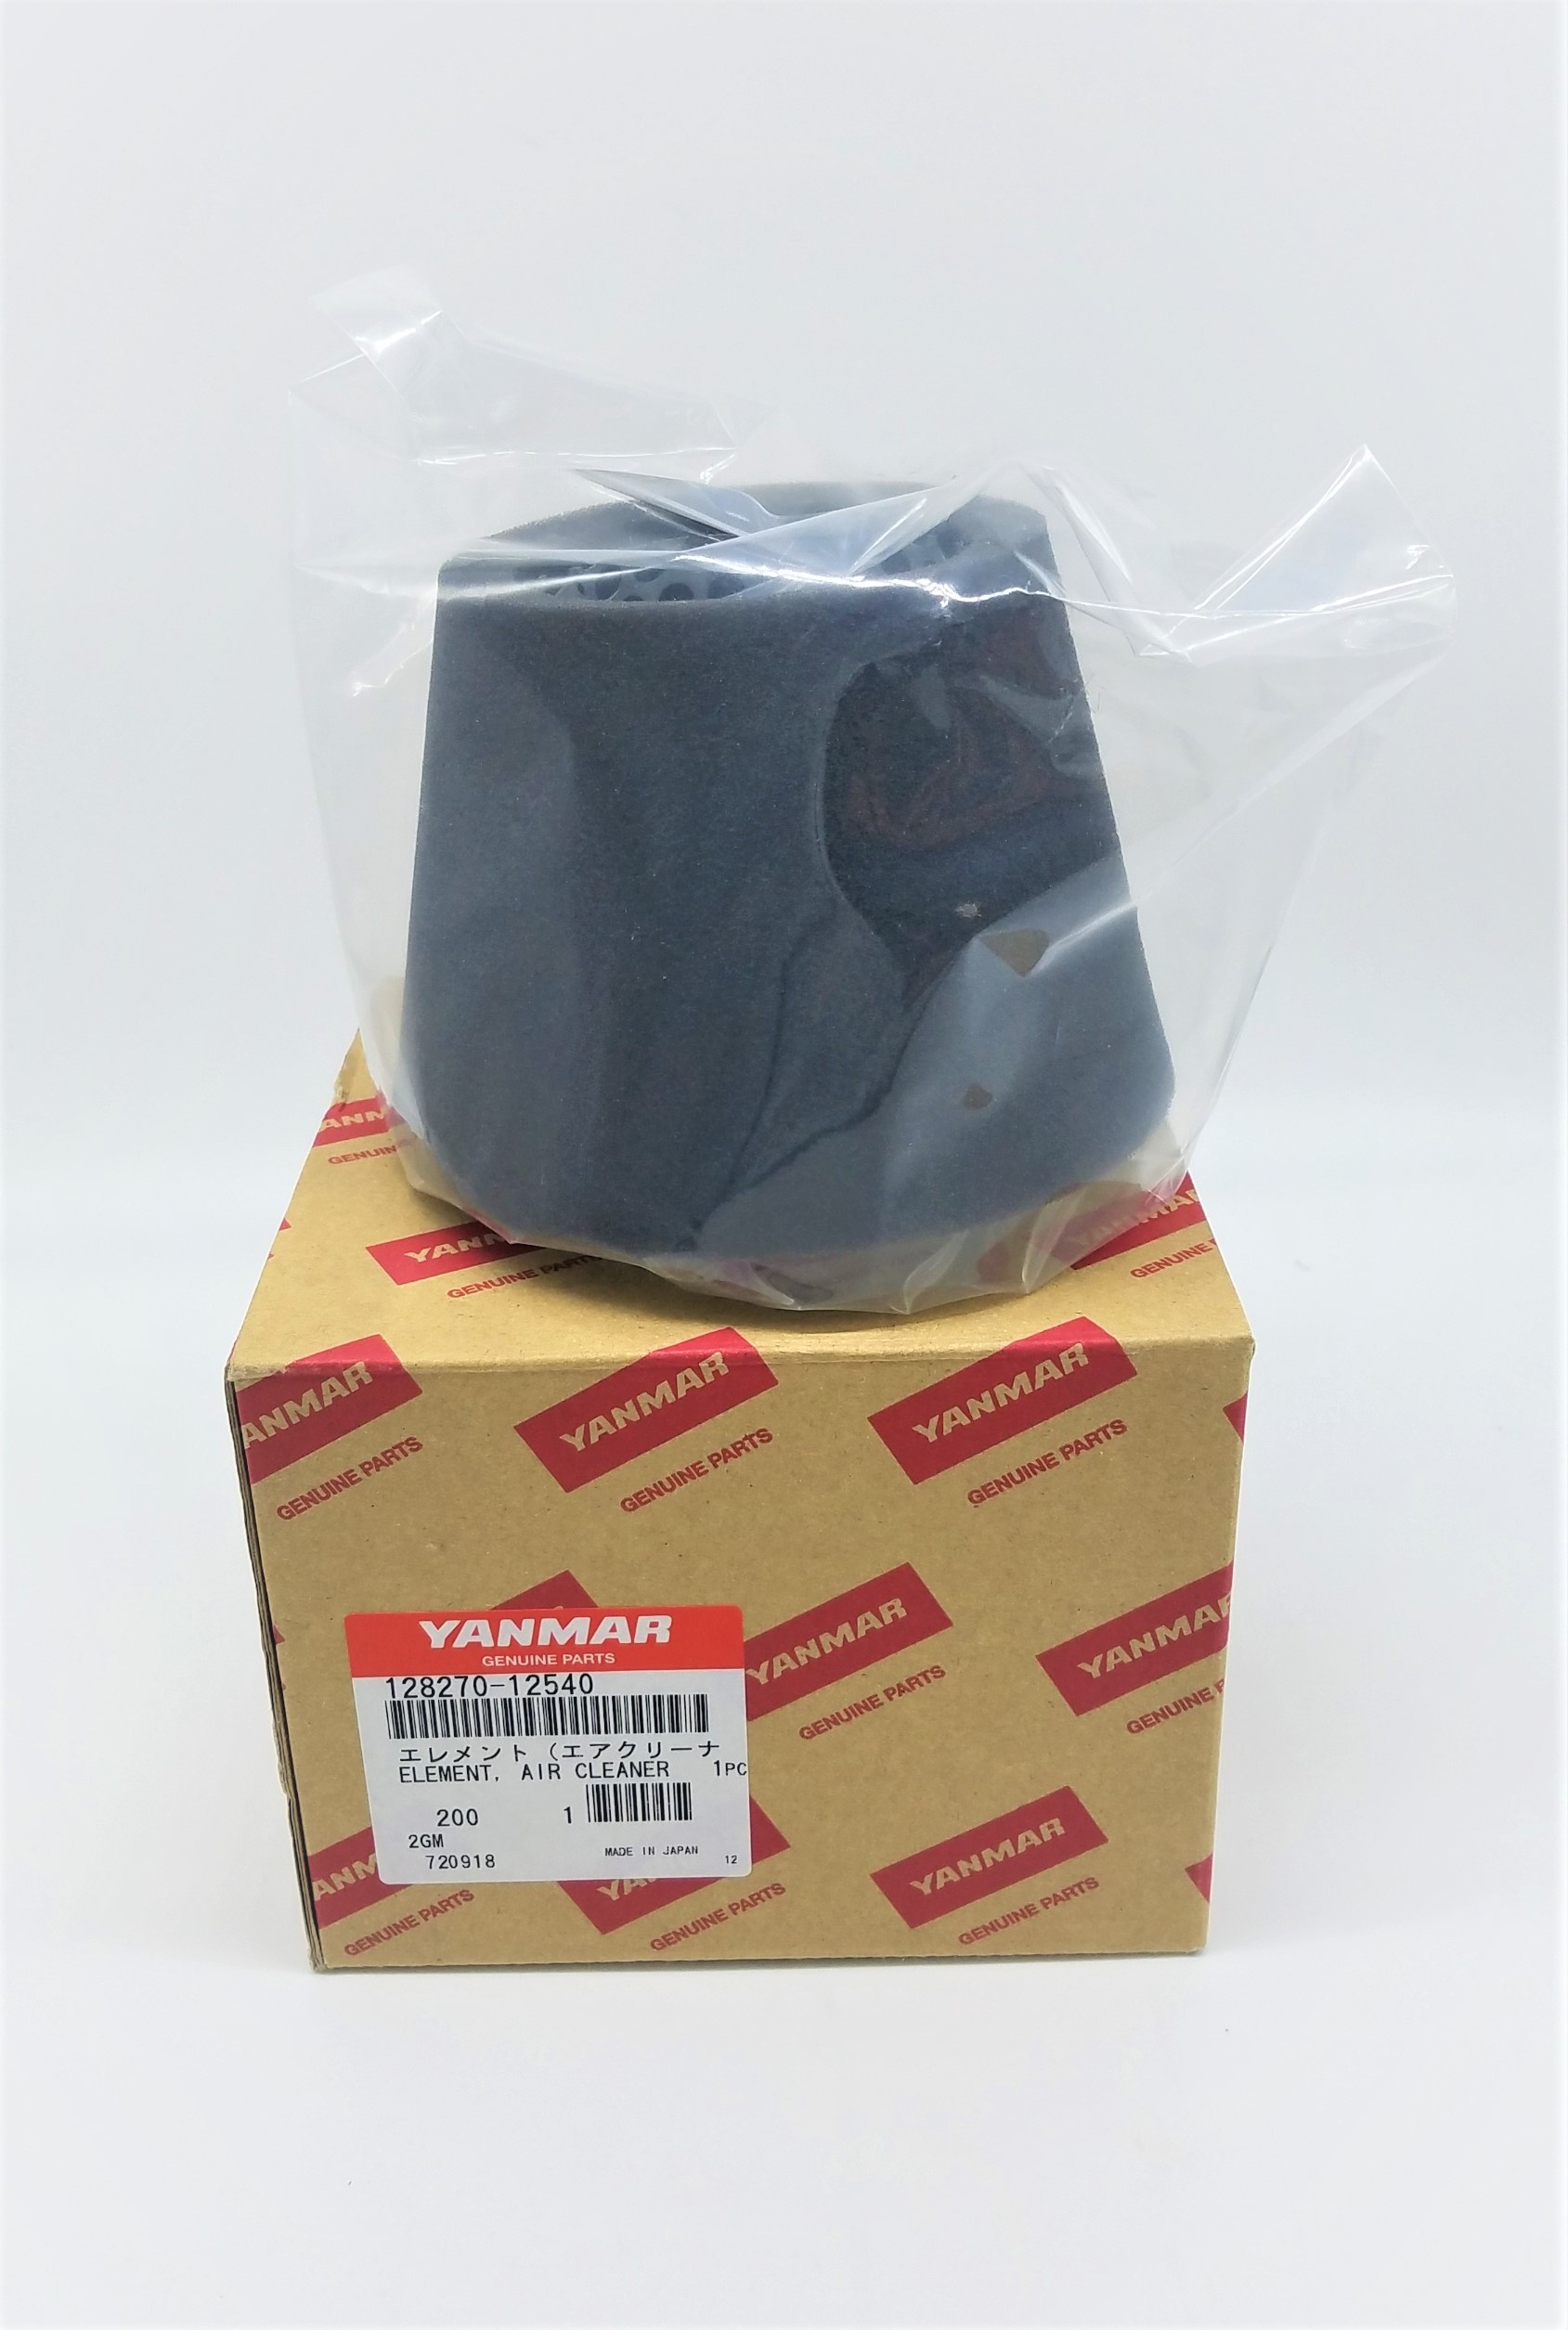 Yanmar 128270-12540 Air Filter Element OEM 2GM//3GM /& 2YM//3YM 2/&3GM30 Series